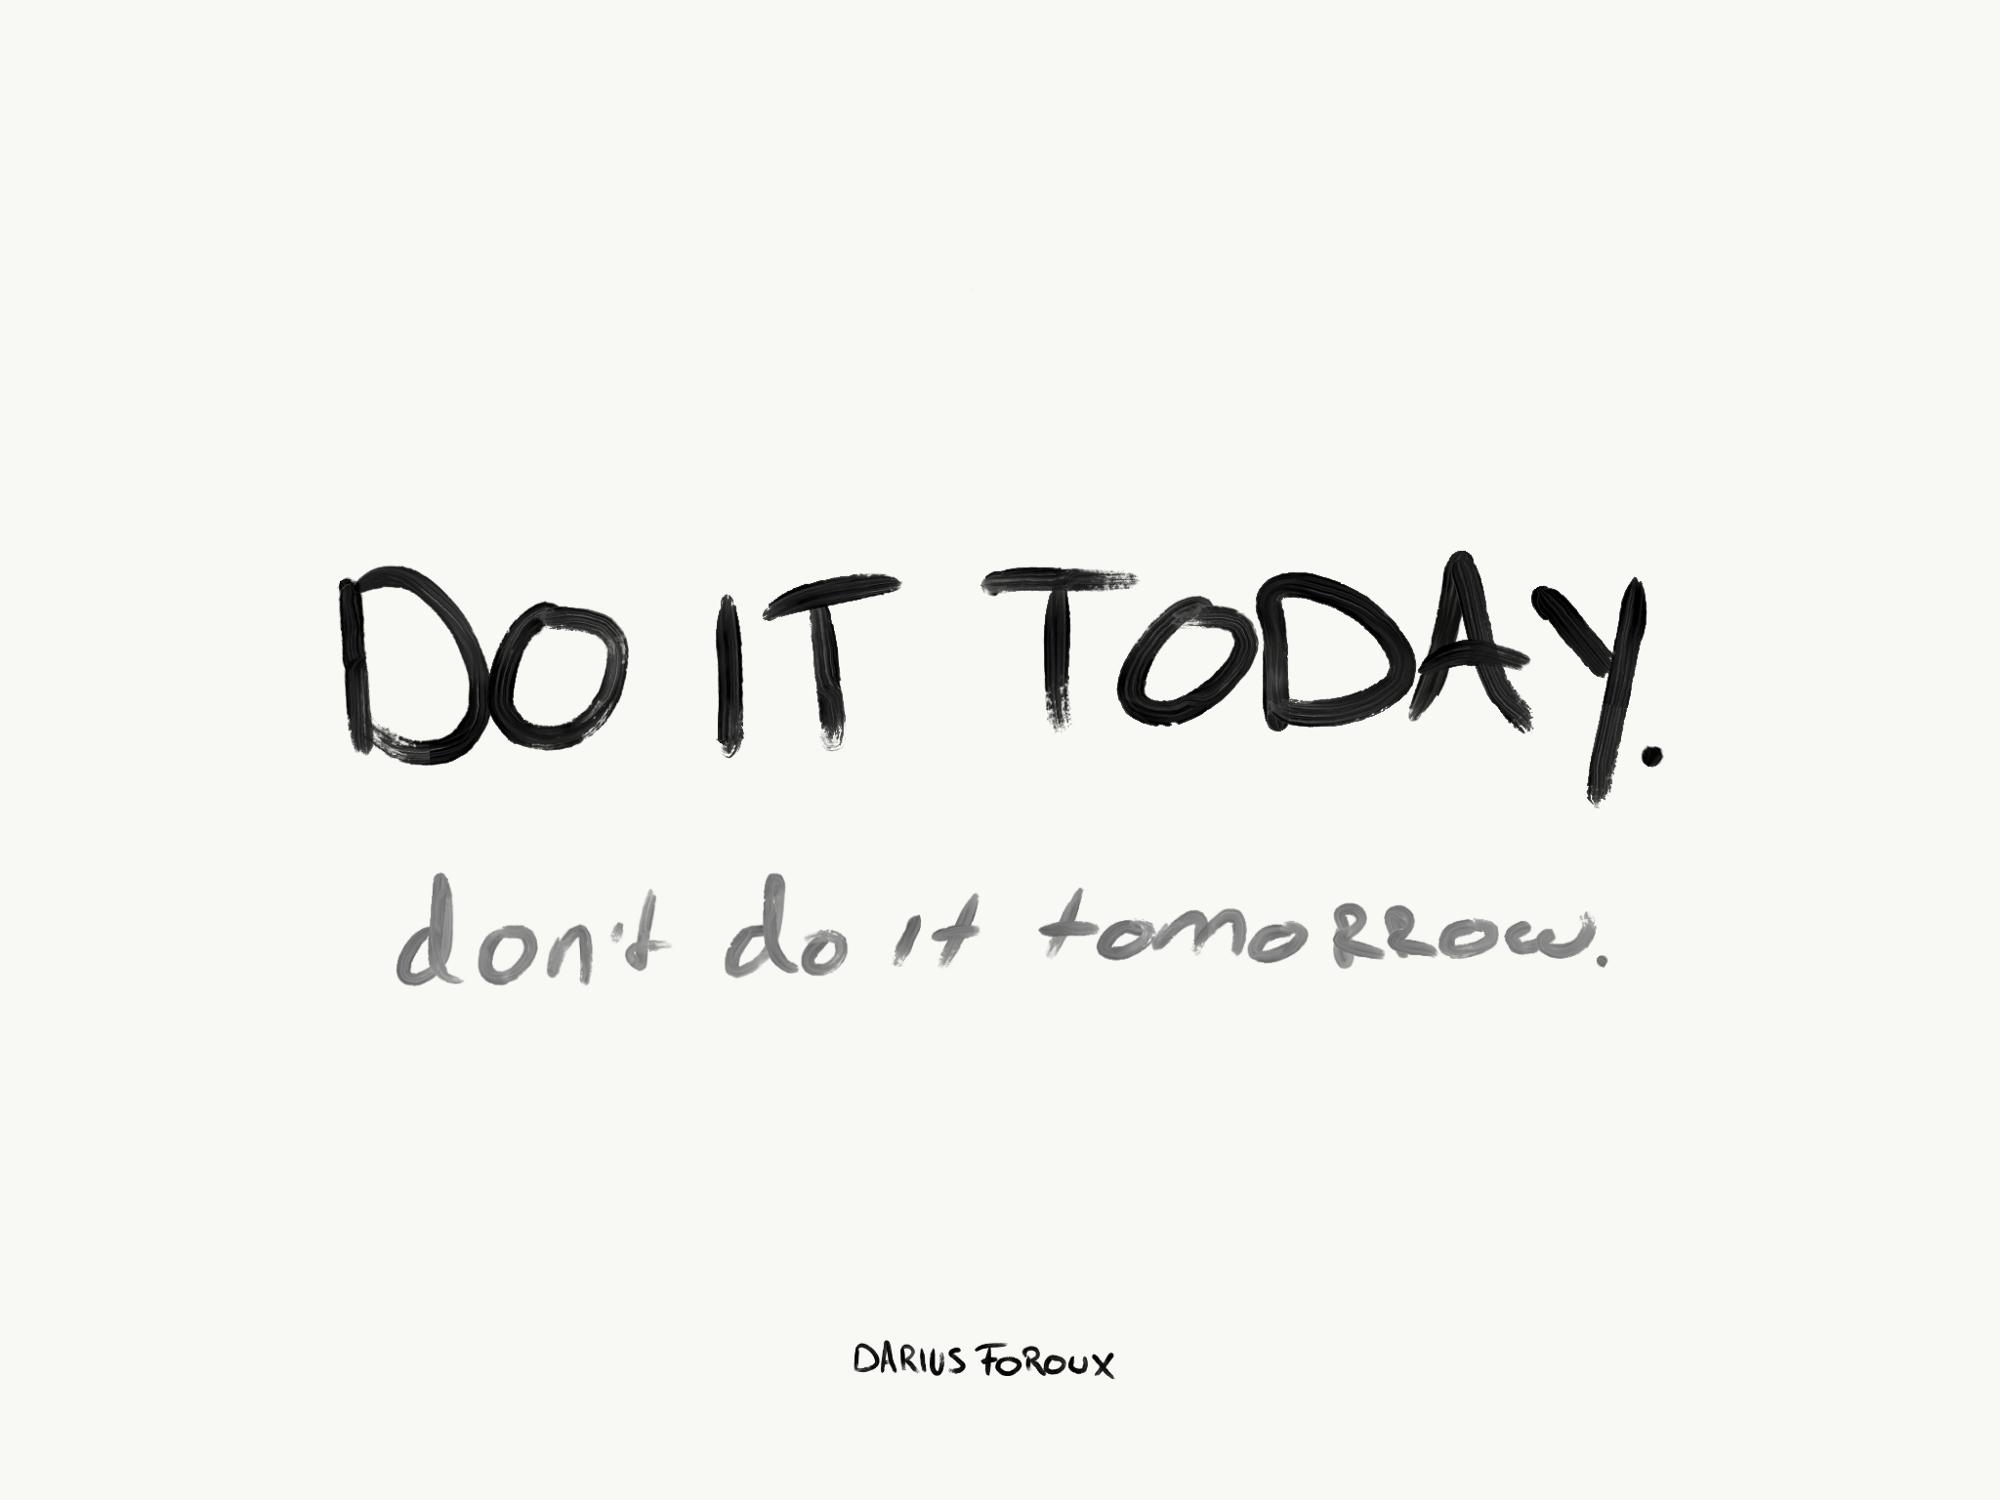 [Image] Don't wait 'till tomorrow